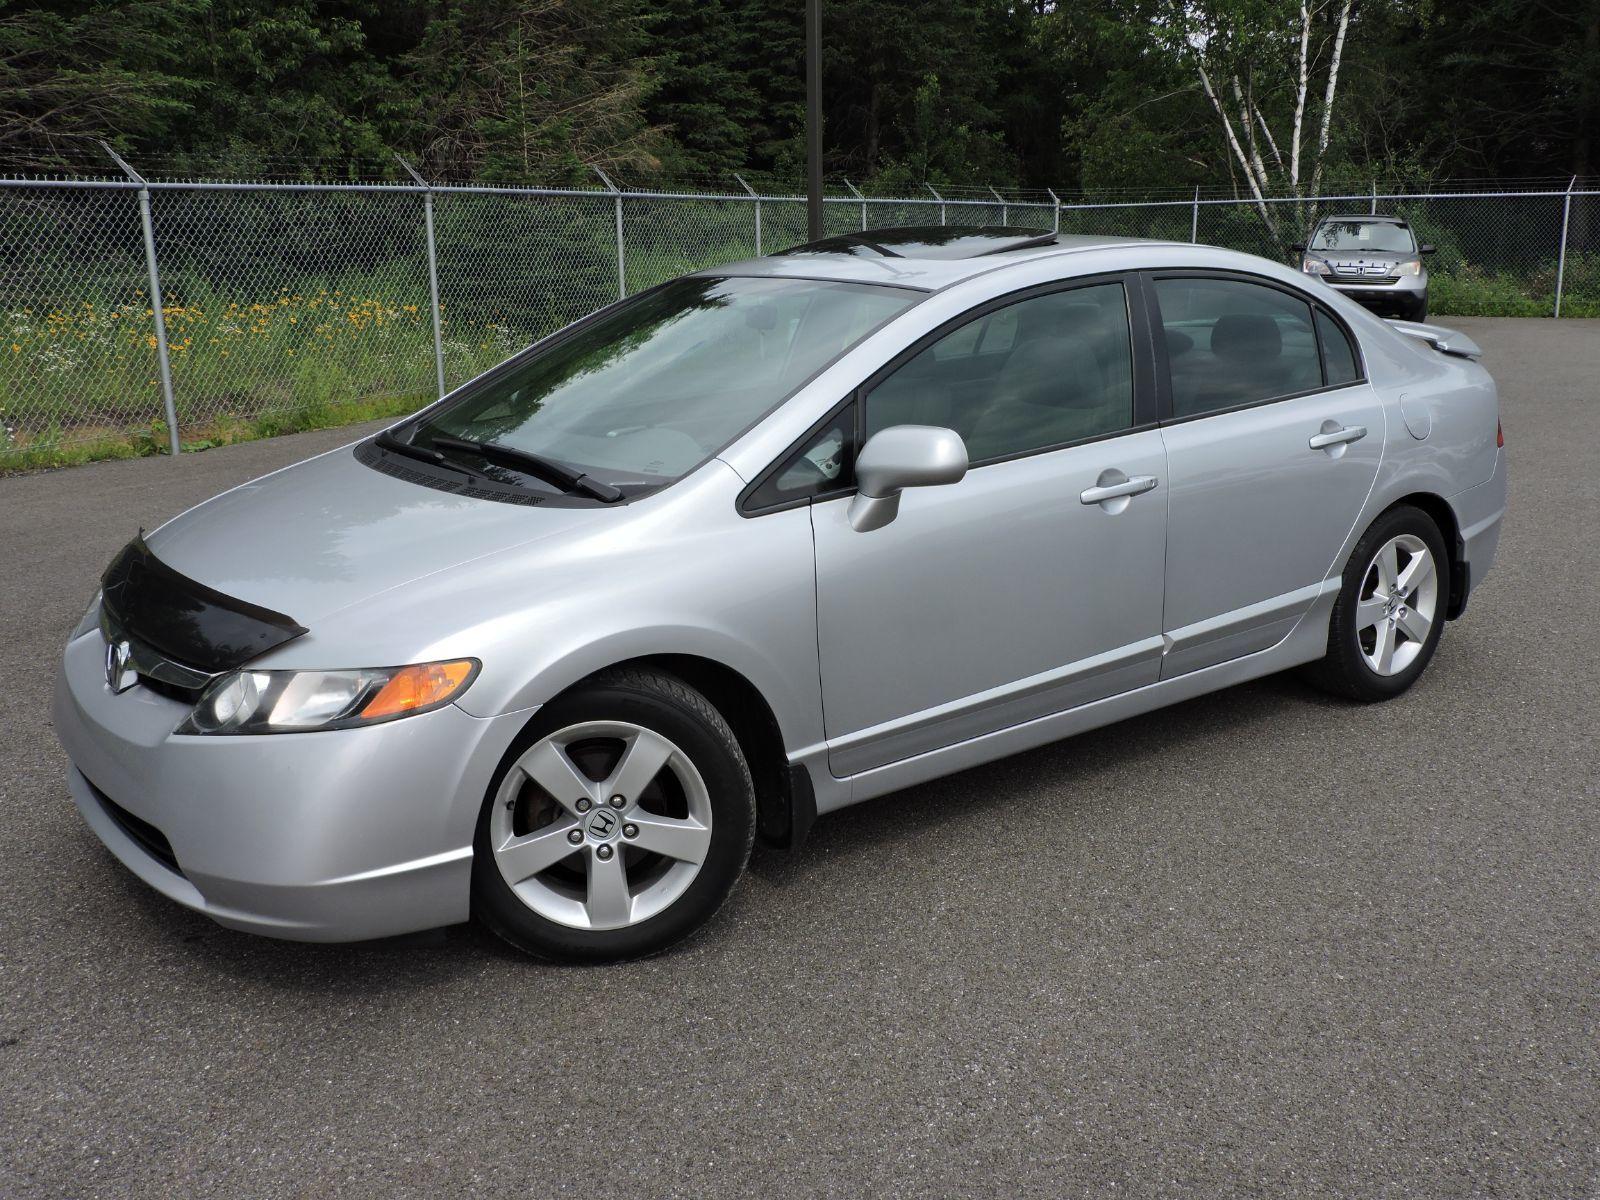 Kekurangan Honda Civic 2007 Murah Berkualitas